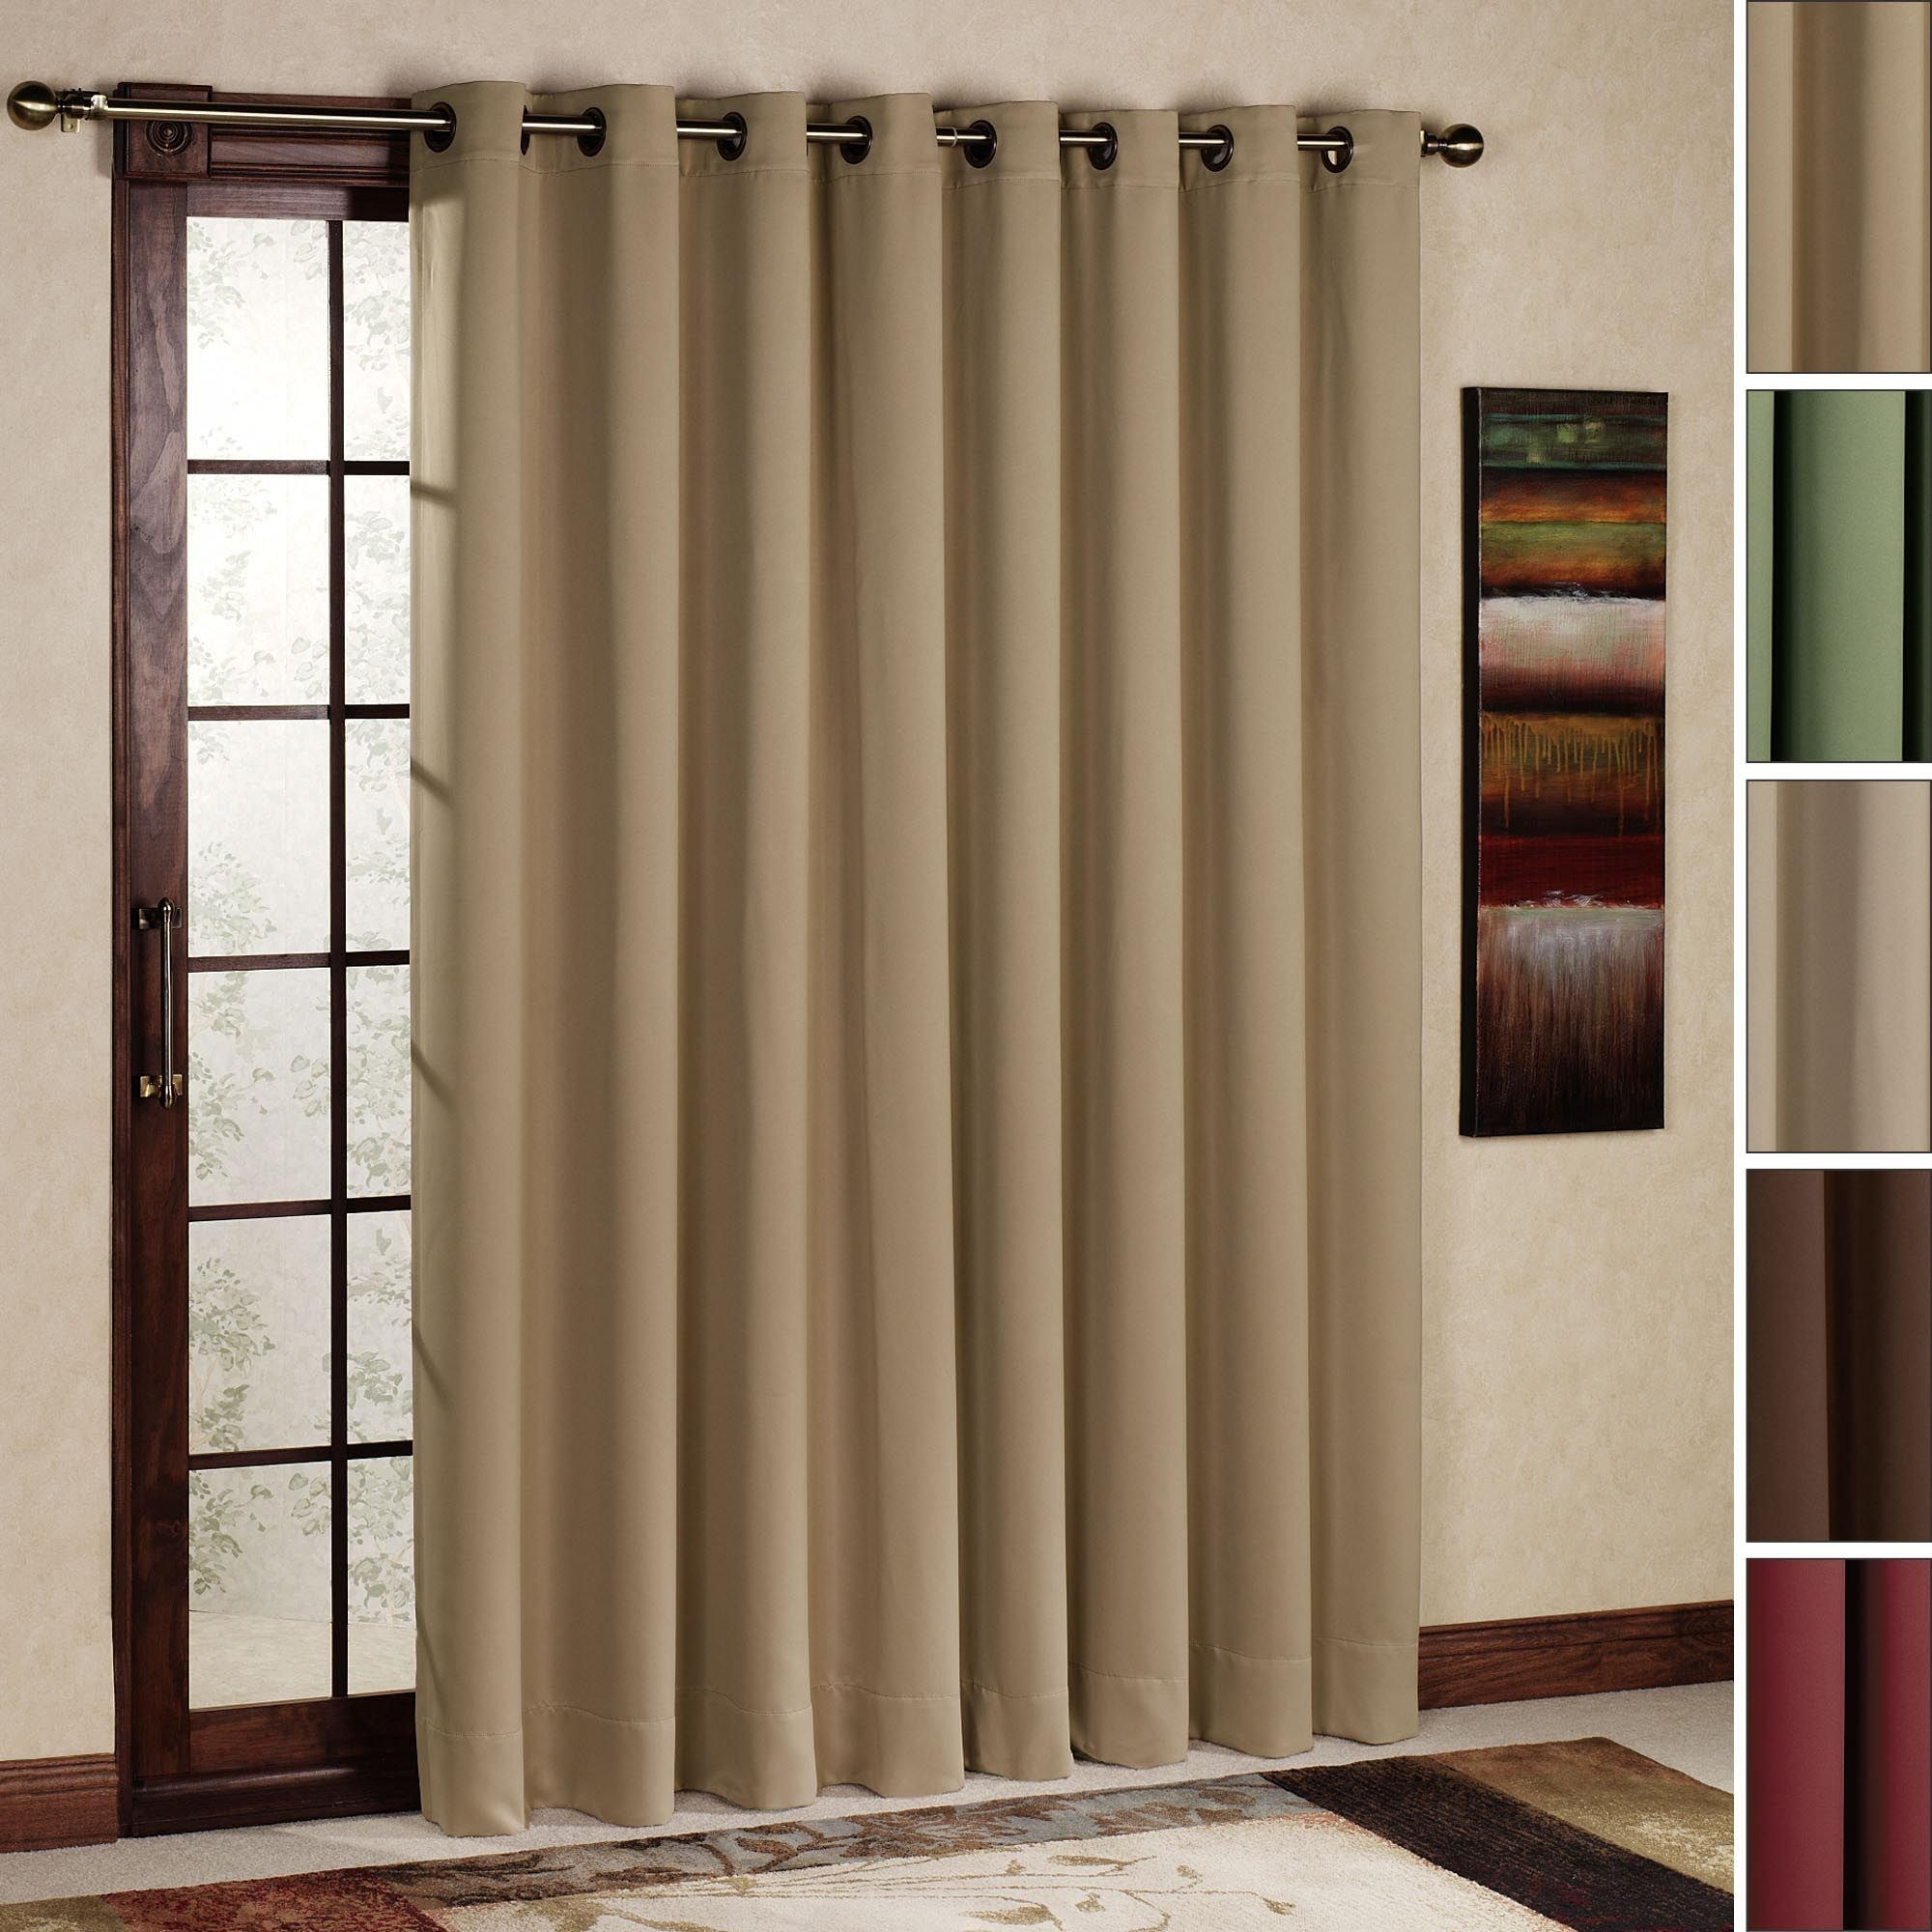 Curtain Rod Size For Sliding Glass Door Window Treatments Design